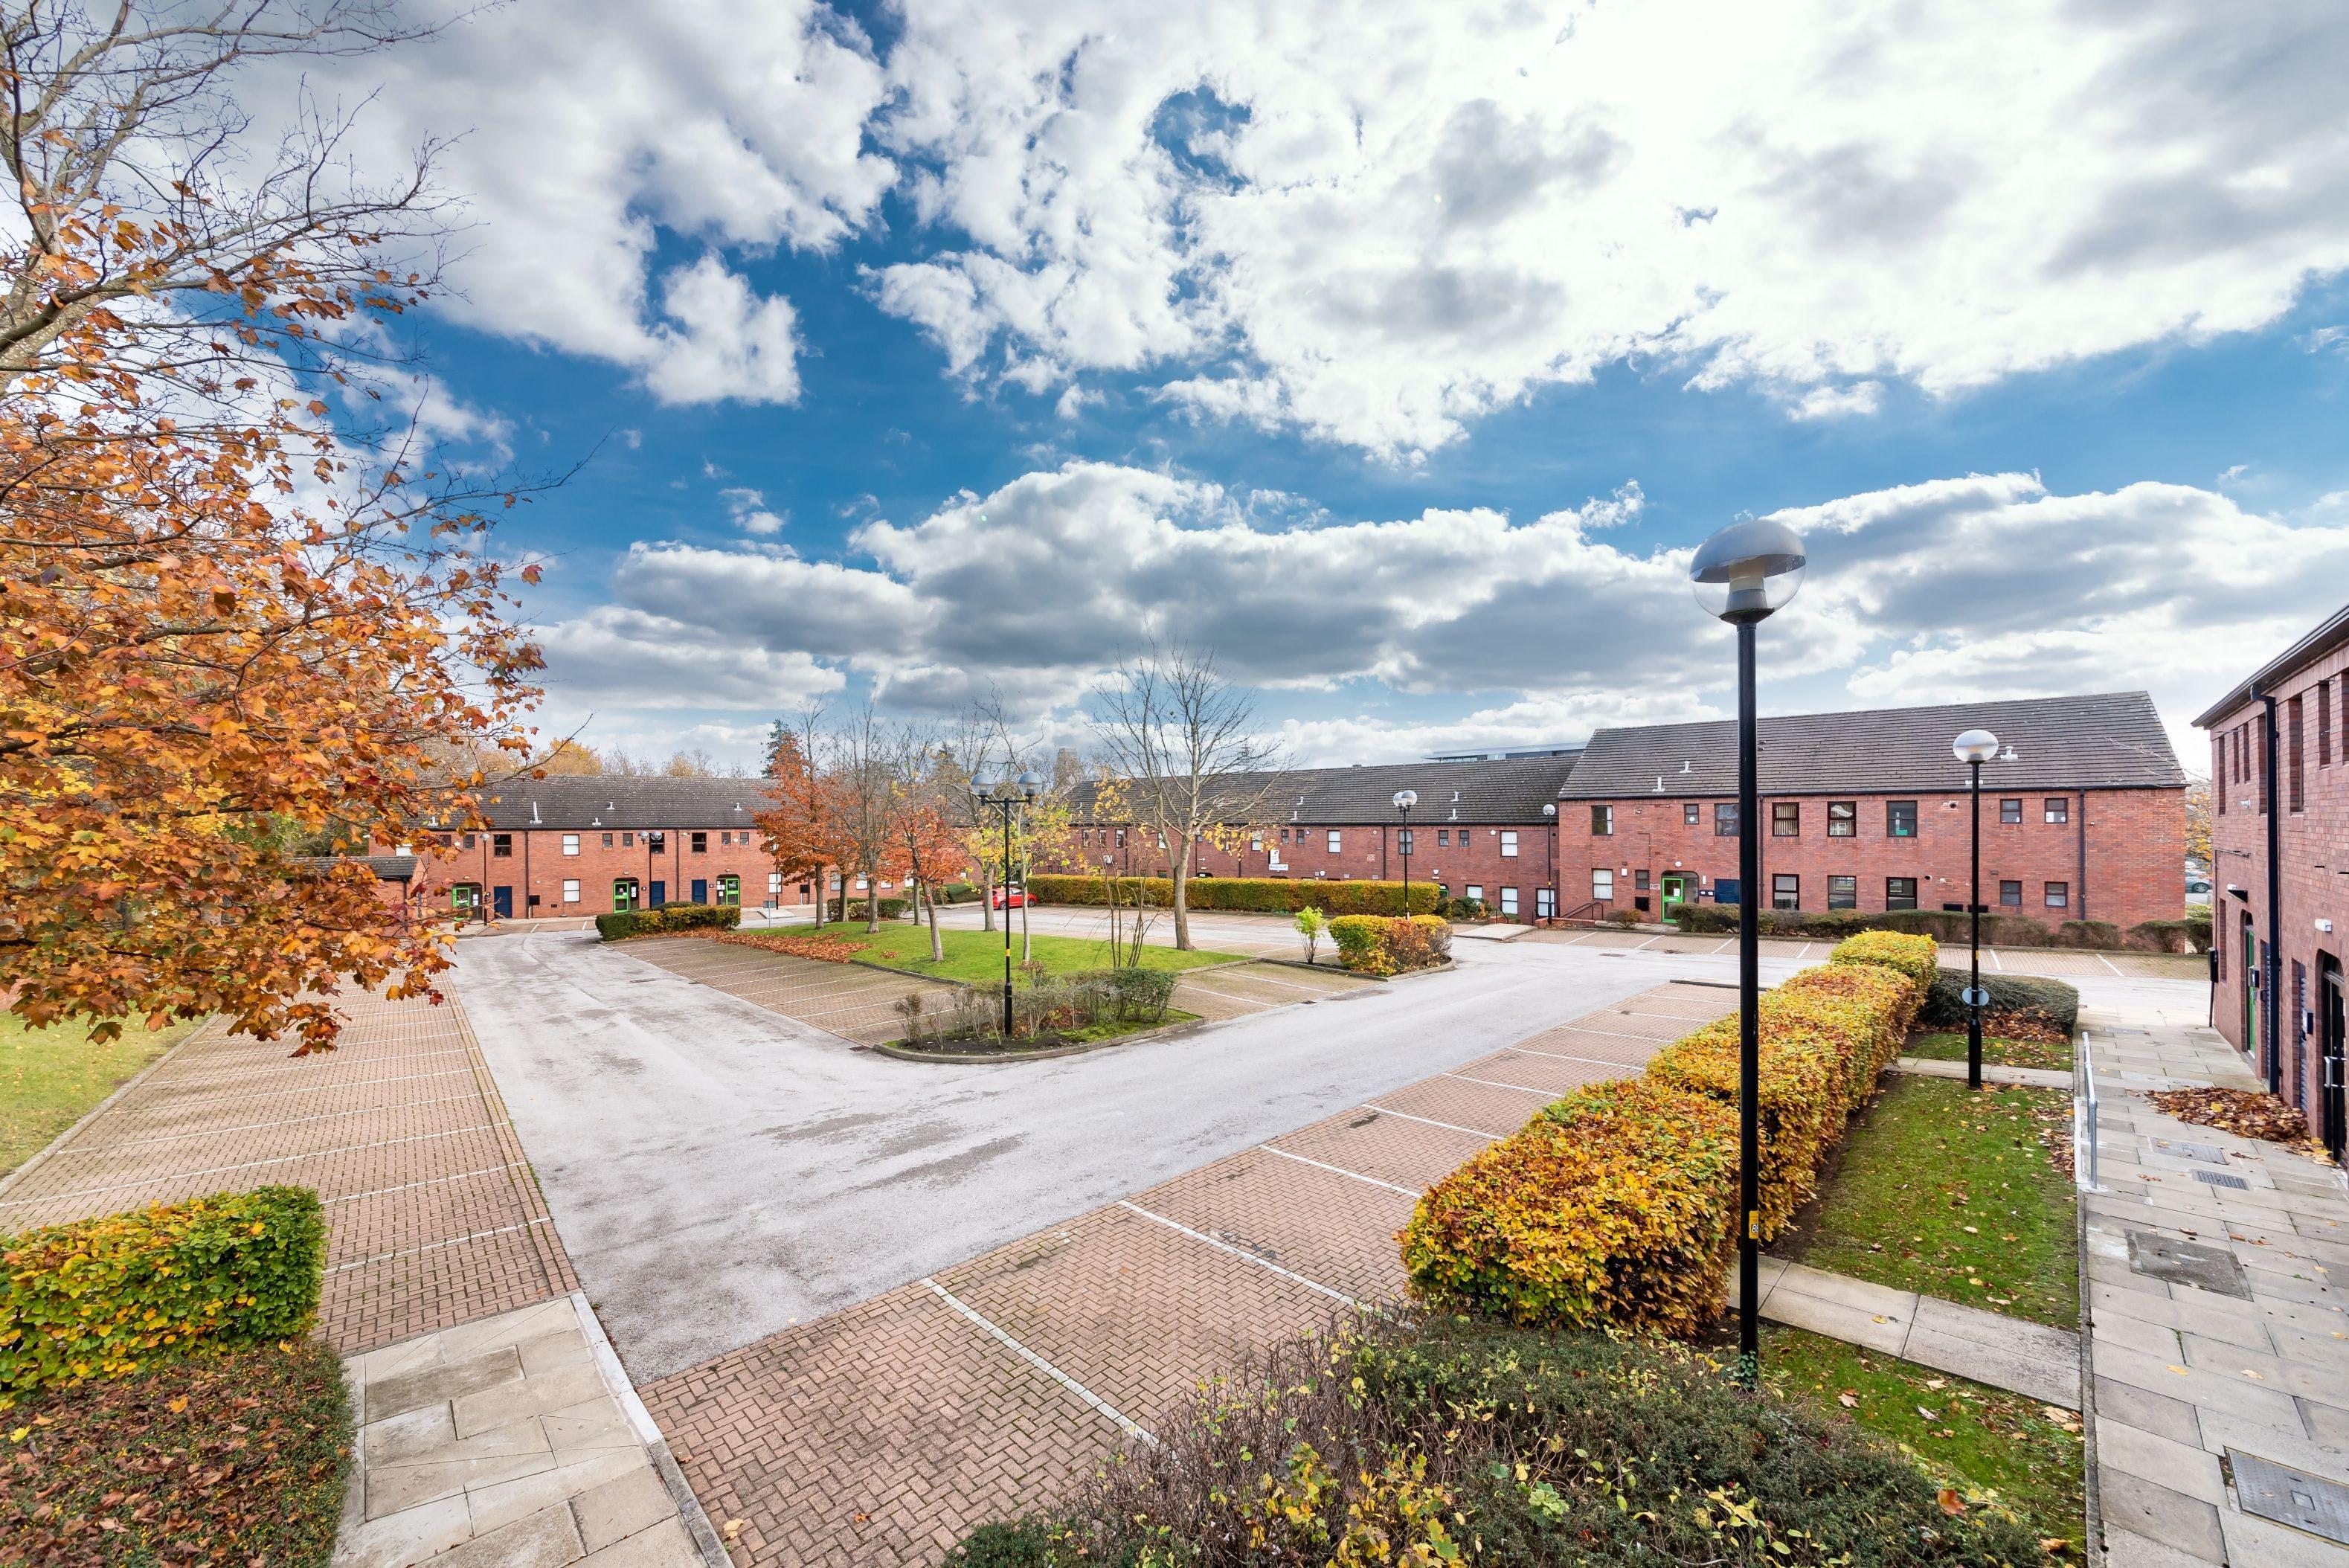 Churchfield Court, Churchfield Court, Barnsley, South Yorkshire, Office To Let - _SPY3239-Edit.jpg